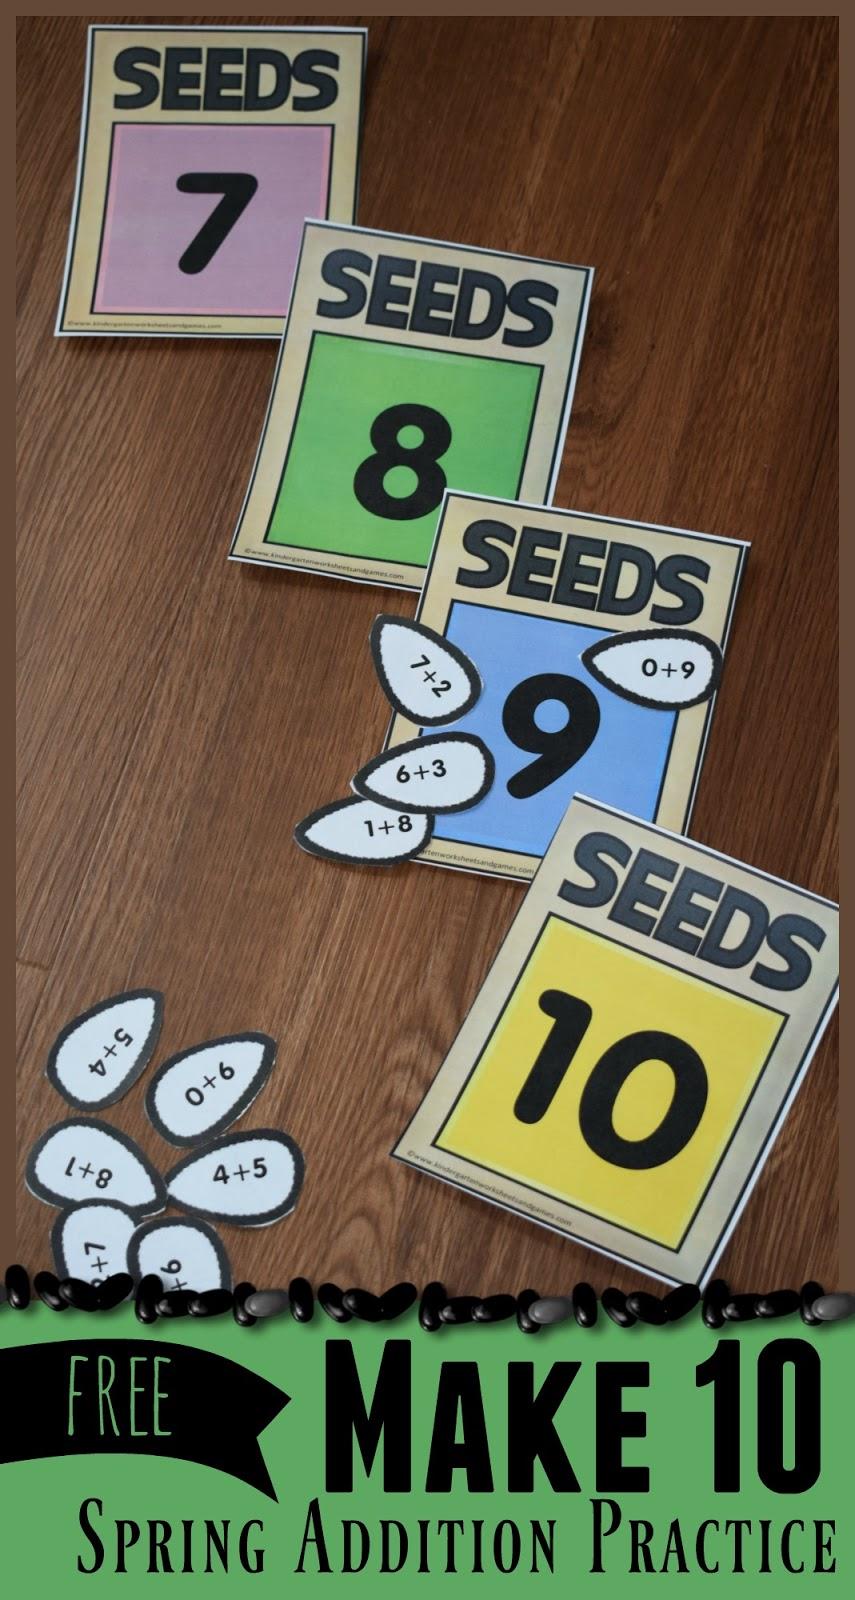 make%2B10%2Bspring%2Baddition%2Bpractice - Free Online Games For Kindergarten